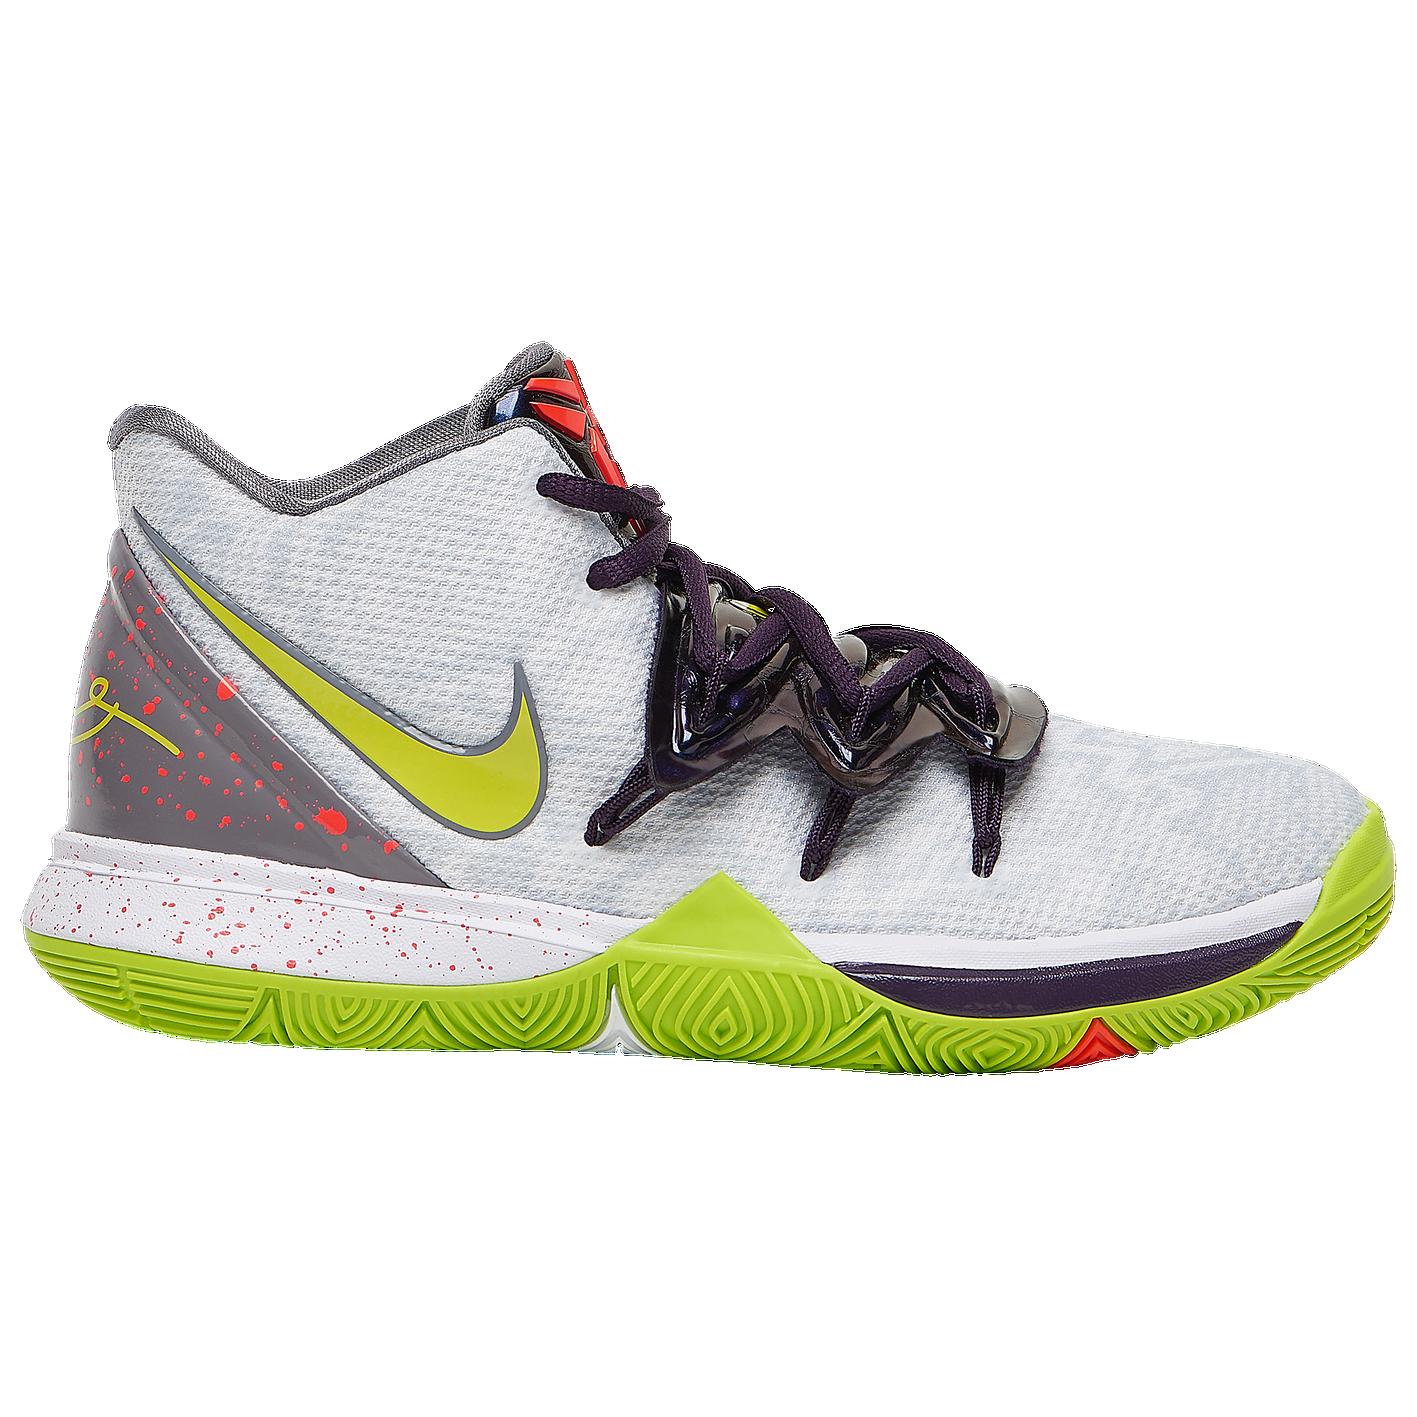 bb3b273ad07 Nike Kyrie 5 - Boys' Grade School - Basketball - Shoes - Irving ...